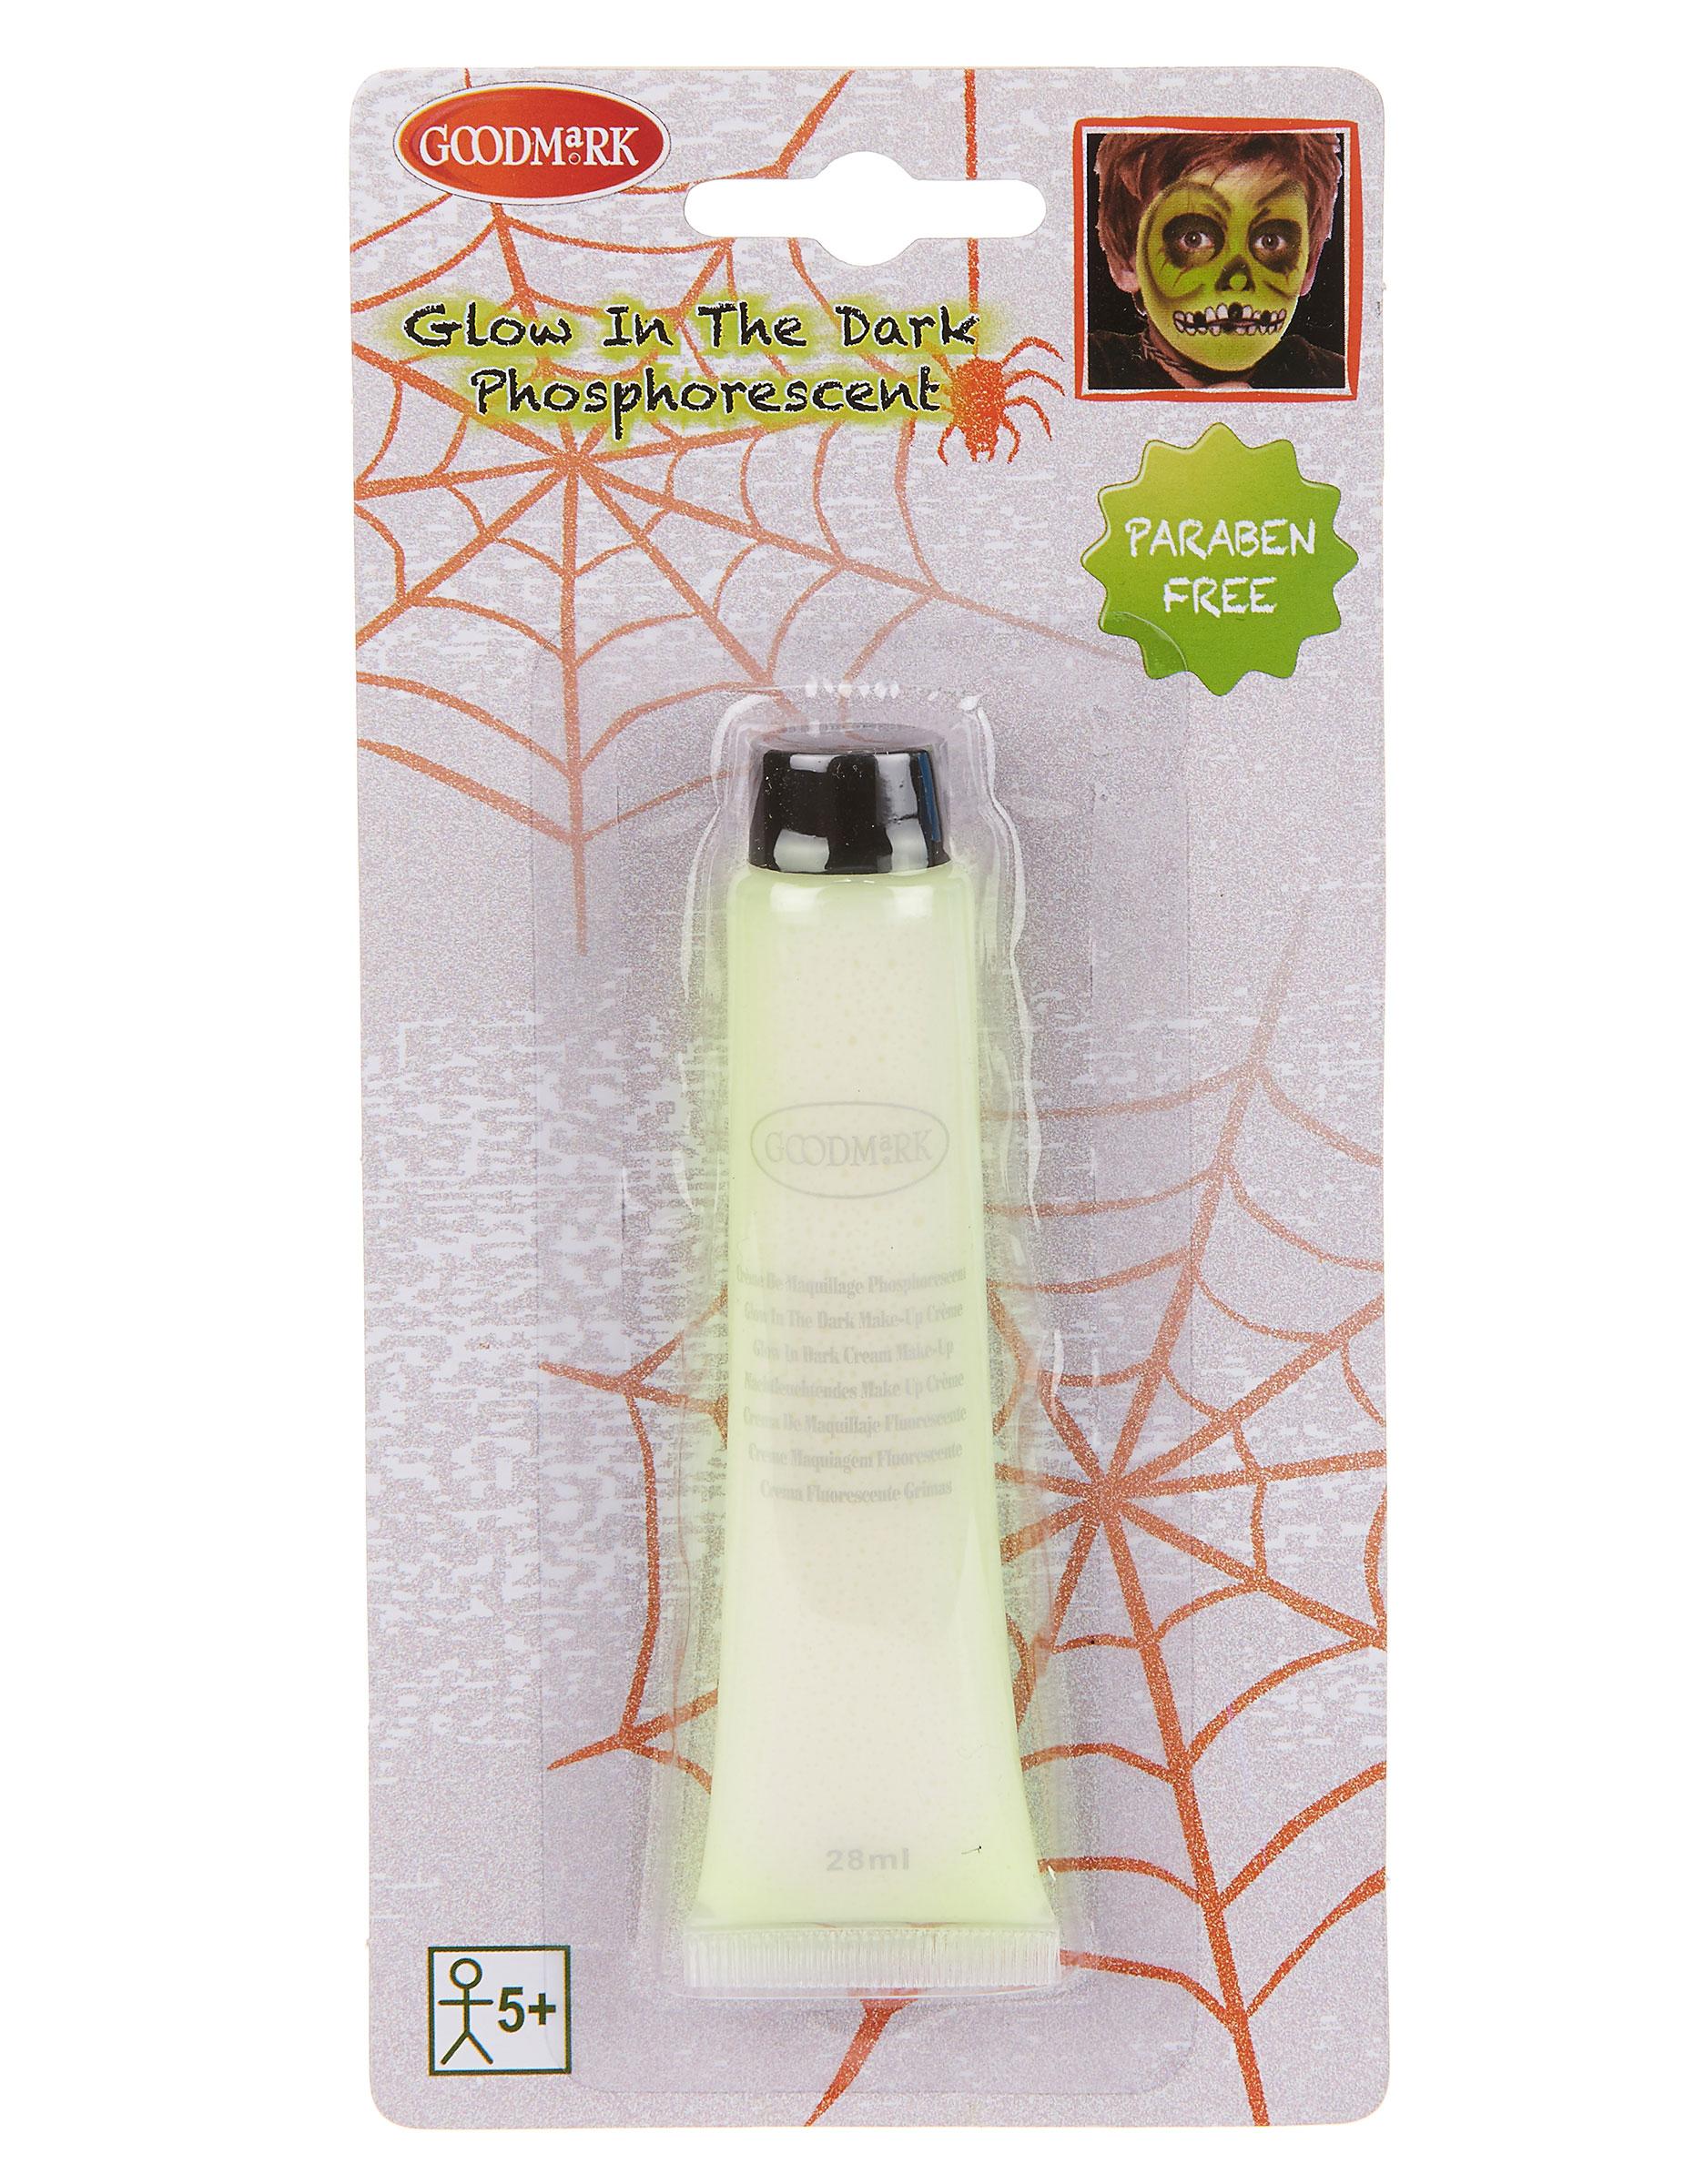 fluoreszierende schminke halloween schminke und g nstige. Black Bedroom Furniture Sets. Home Design Ideas